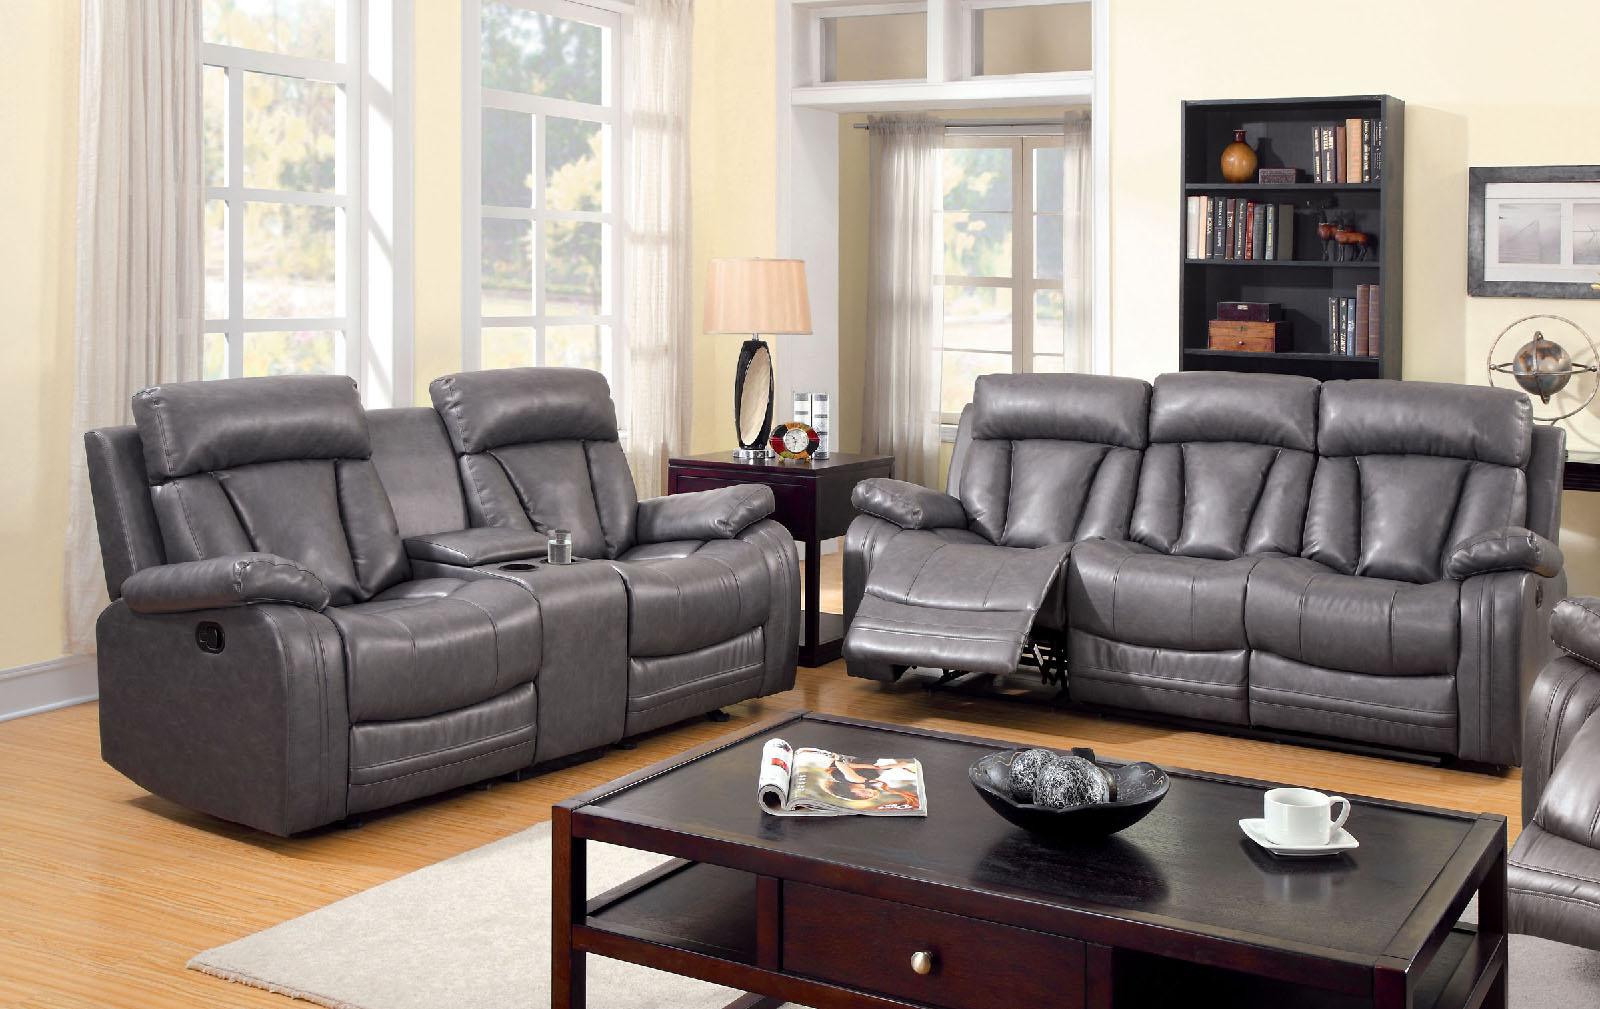 Cm6976 4 Recliners Sofa Love 1 399